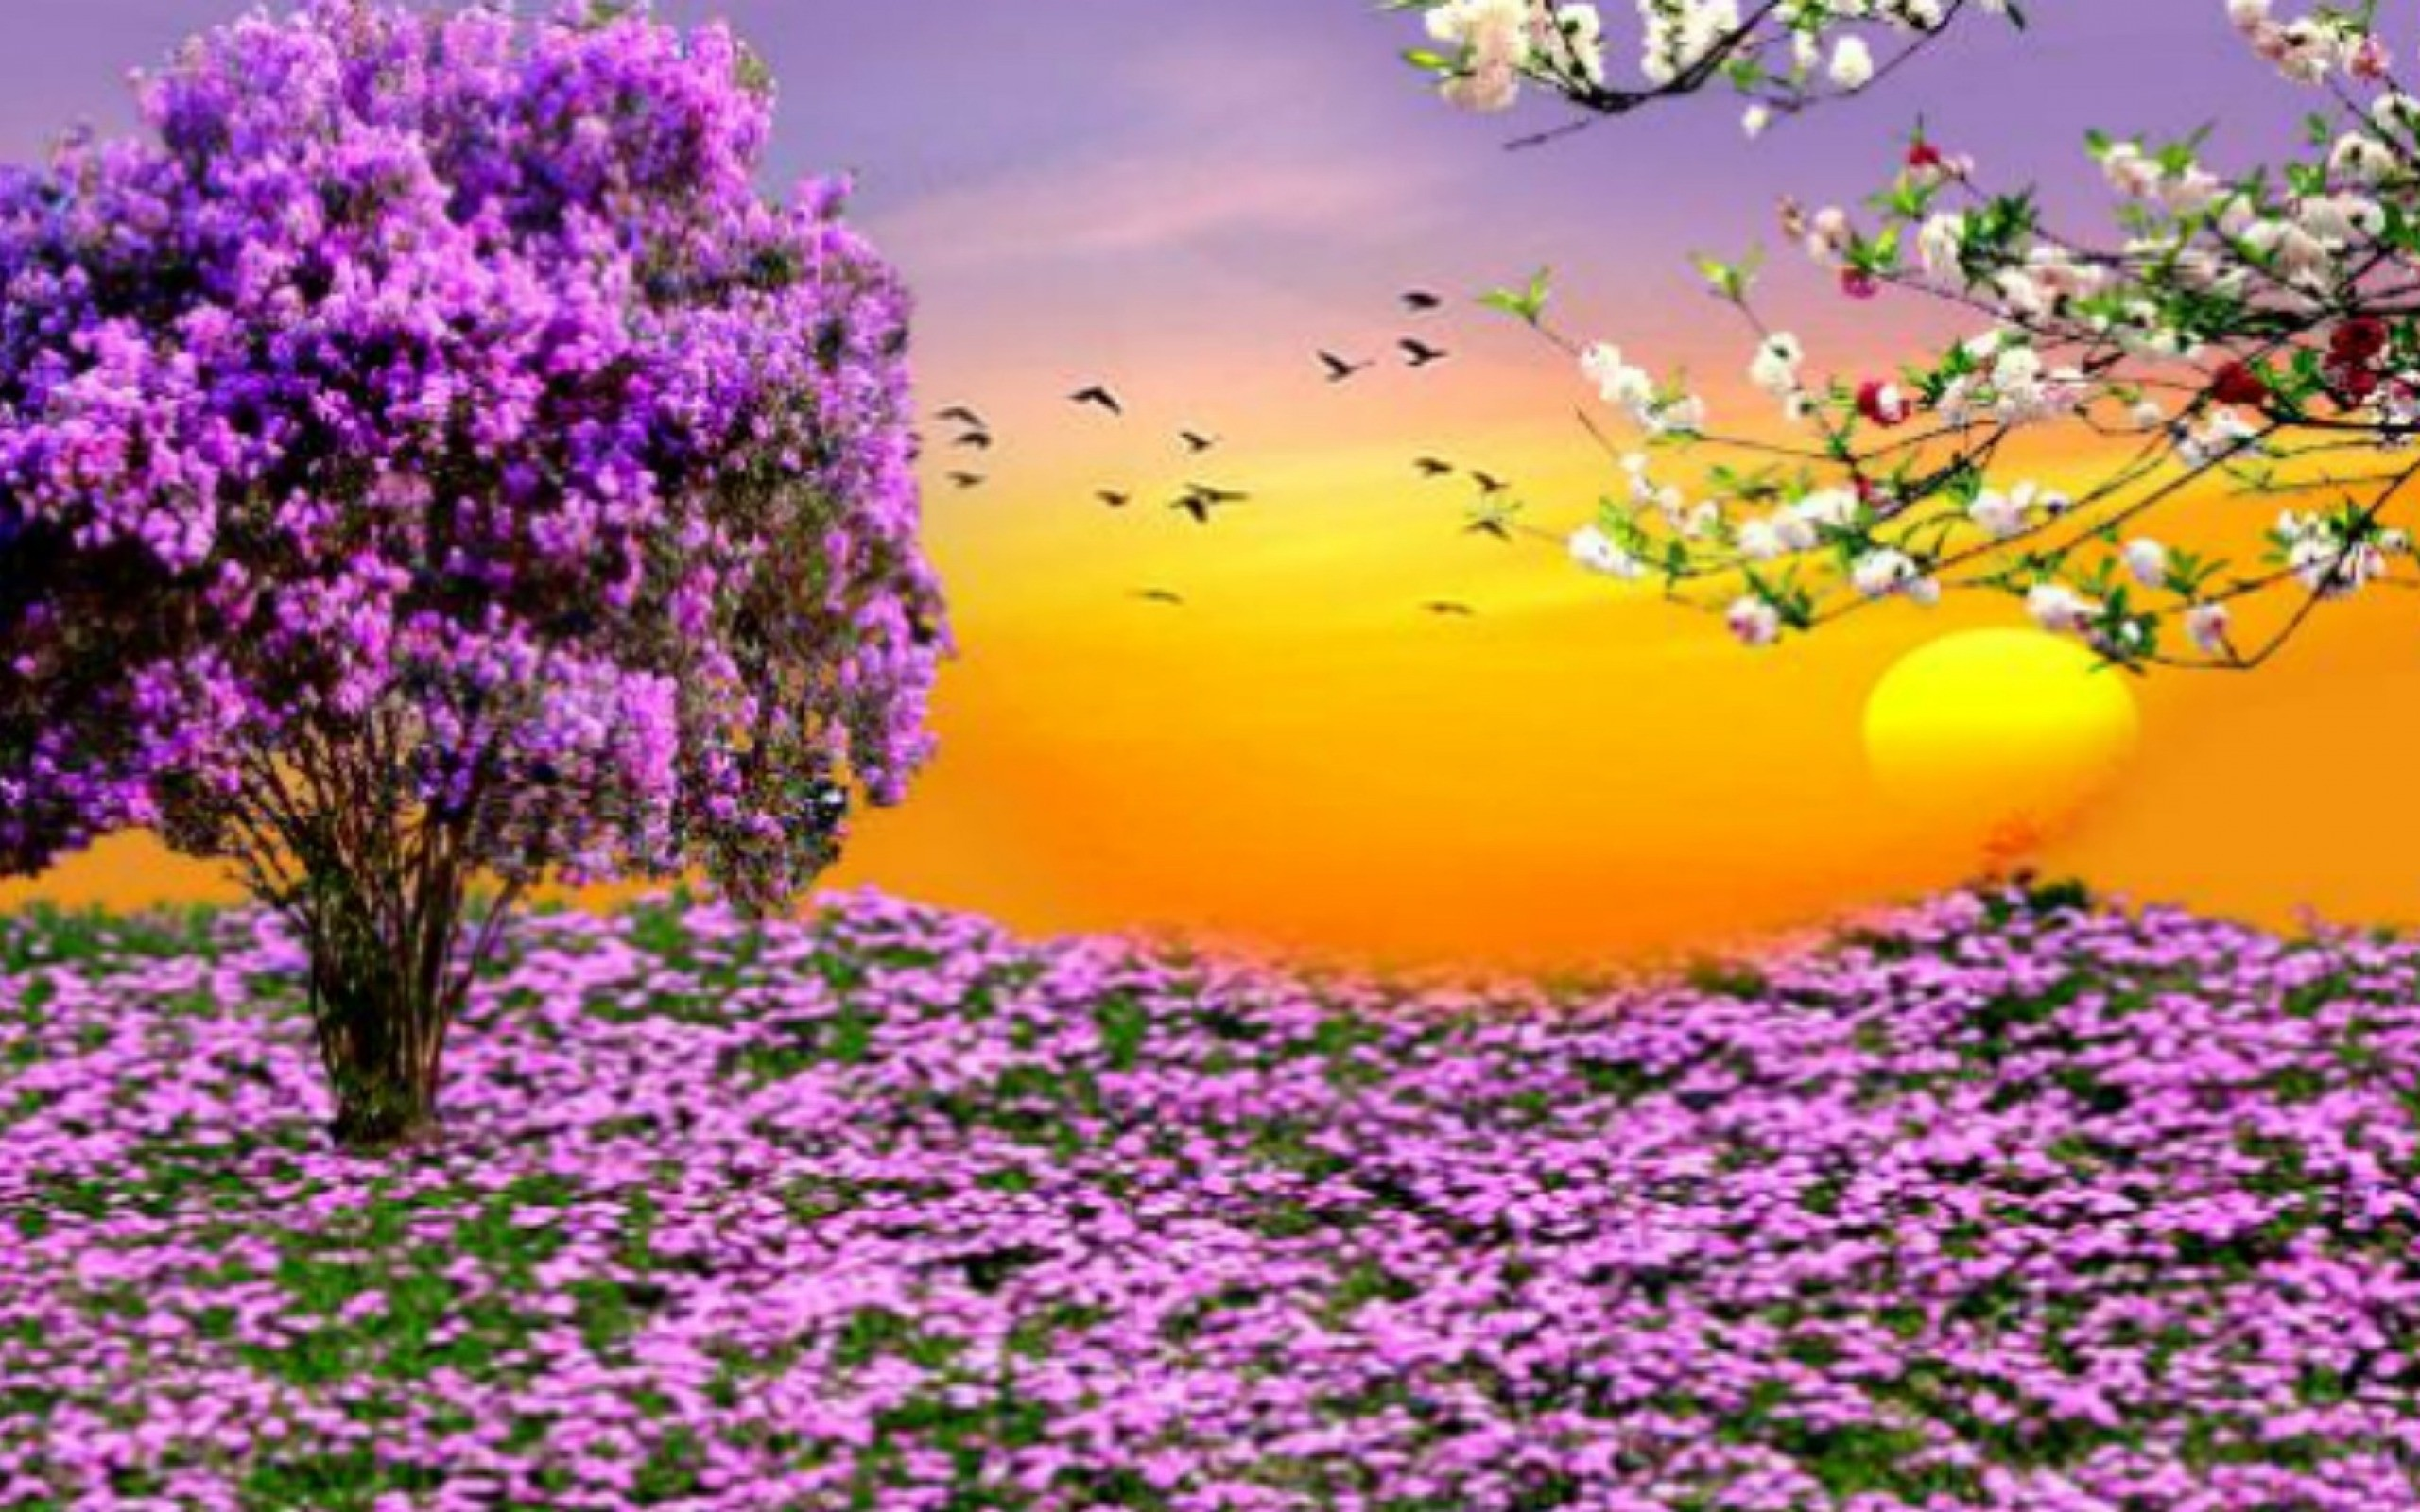 Desktop Wallpaper Spring Scenes ·① WallpaperTag